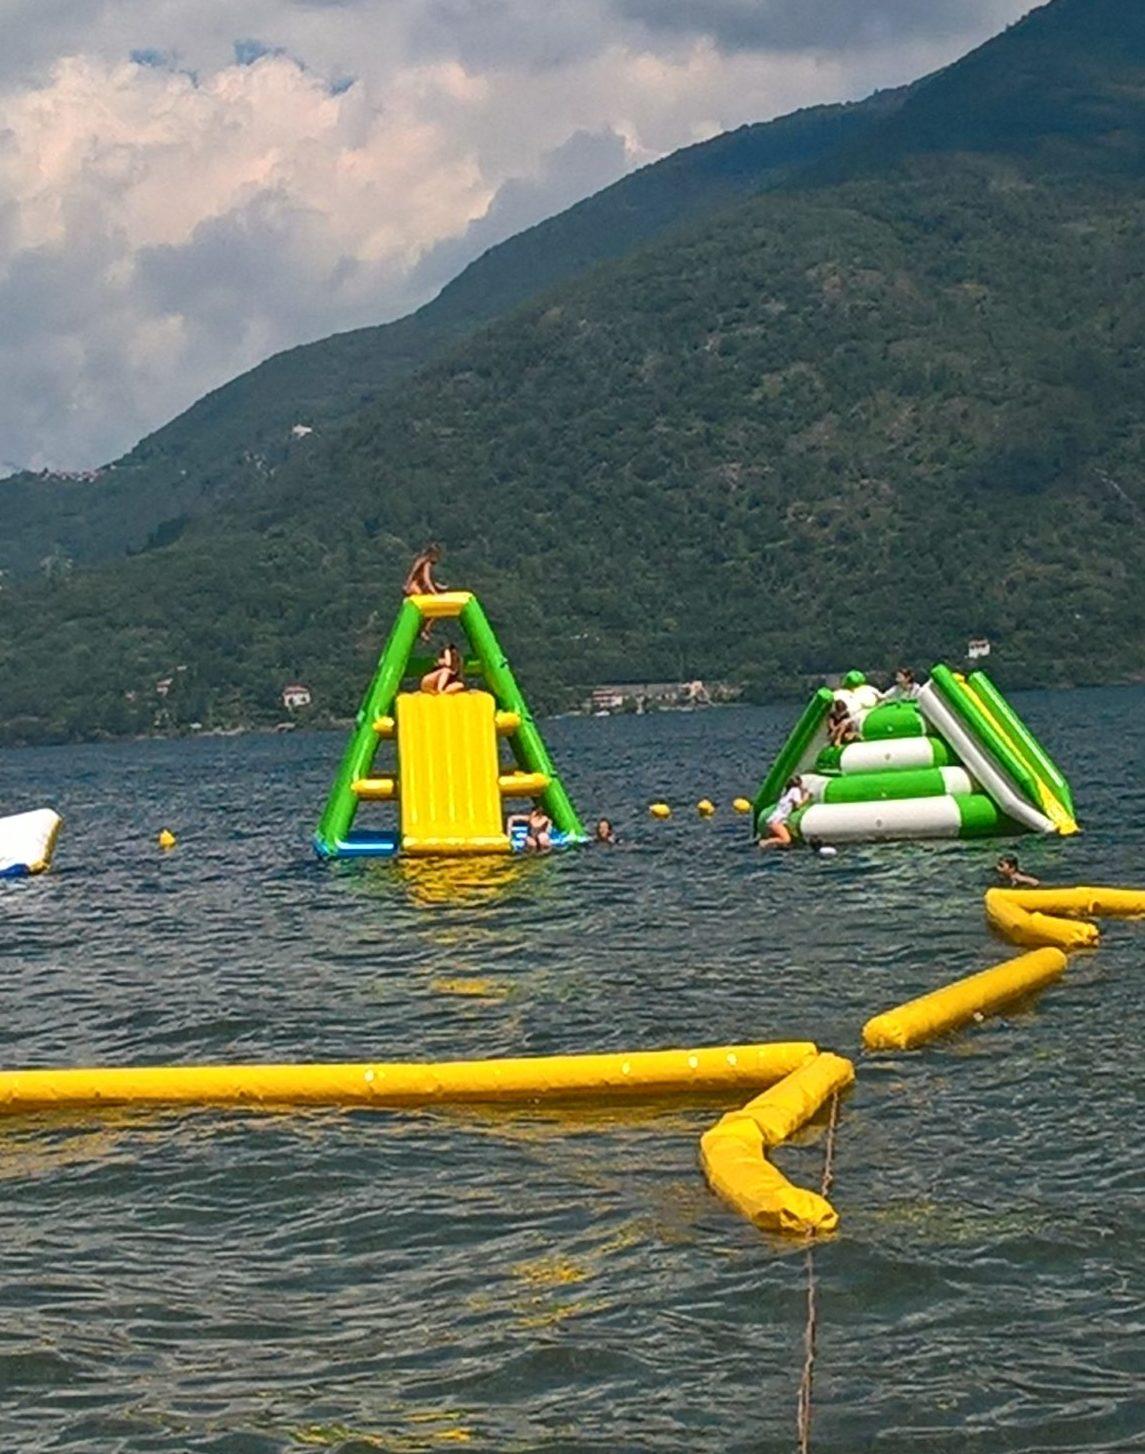 Lake Maggiore activities